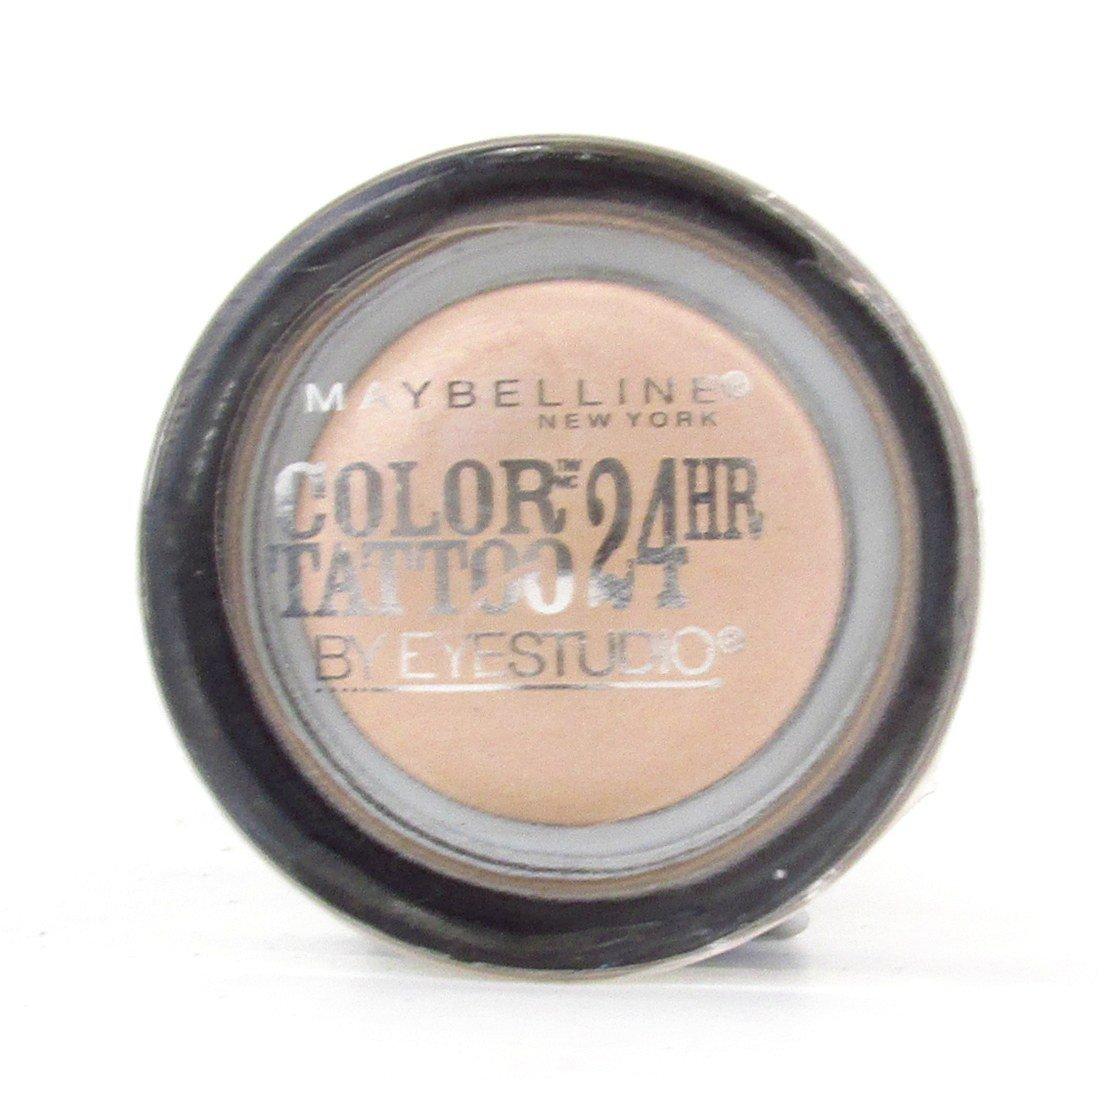 Maybelline eye studio color tattoo metal 24 hour cream gel for Maybelline color tattoo gel eyeshadow